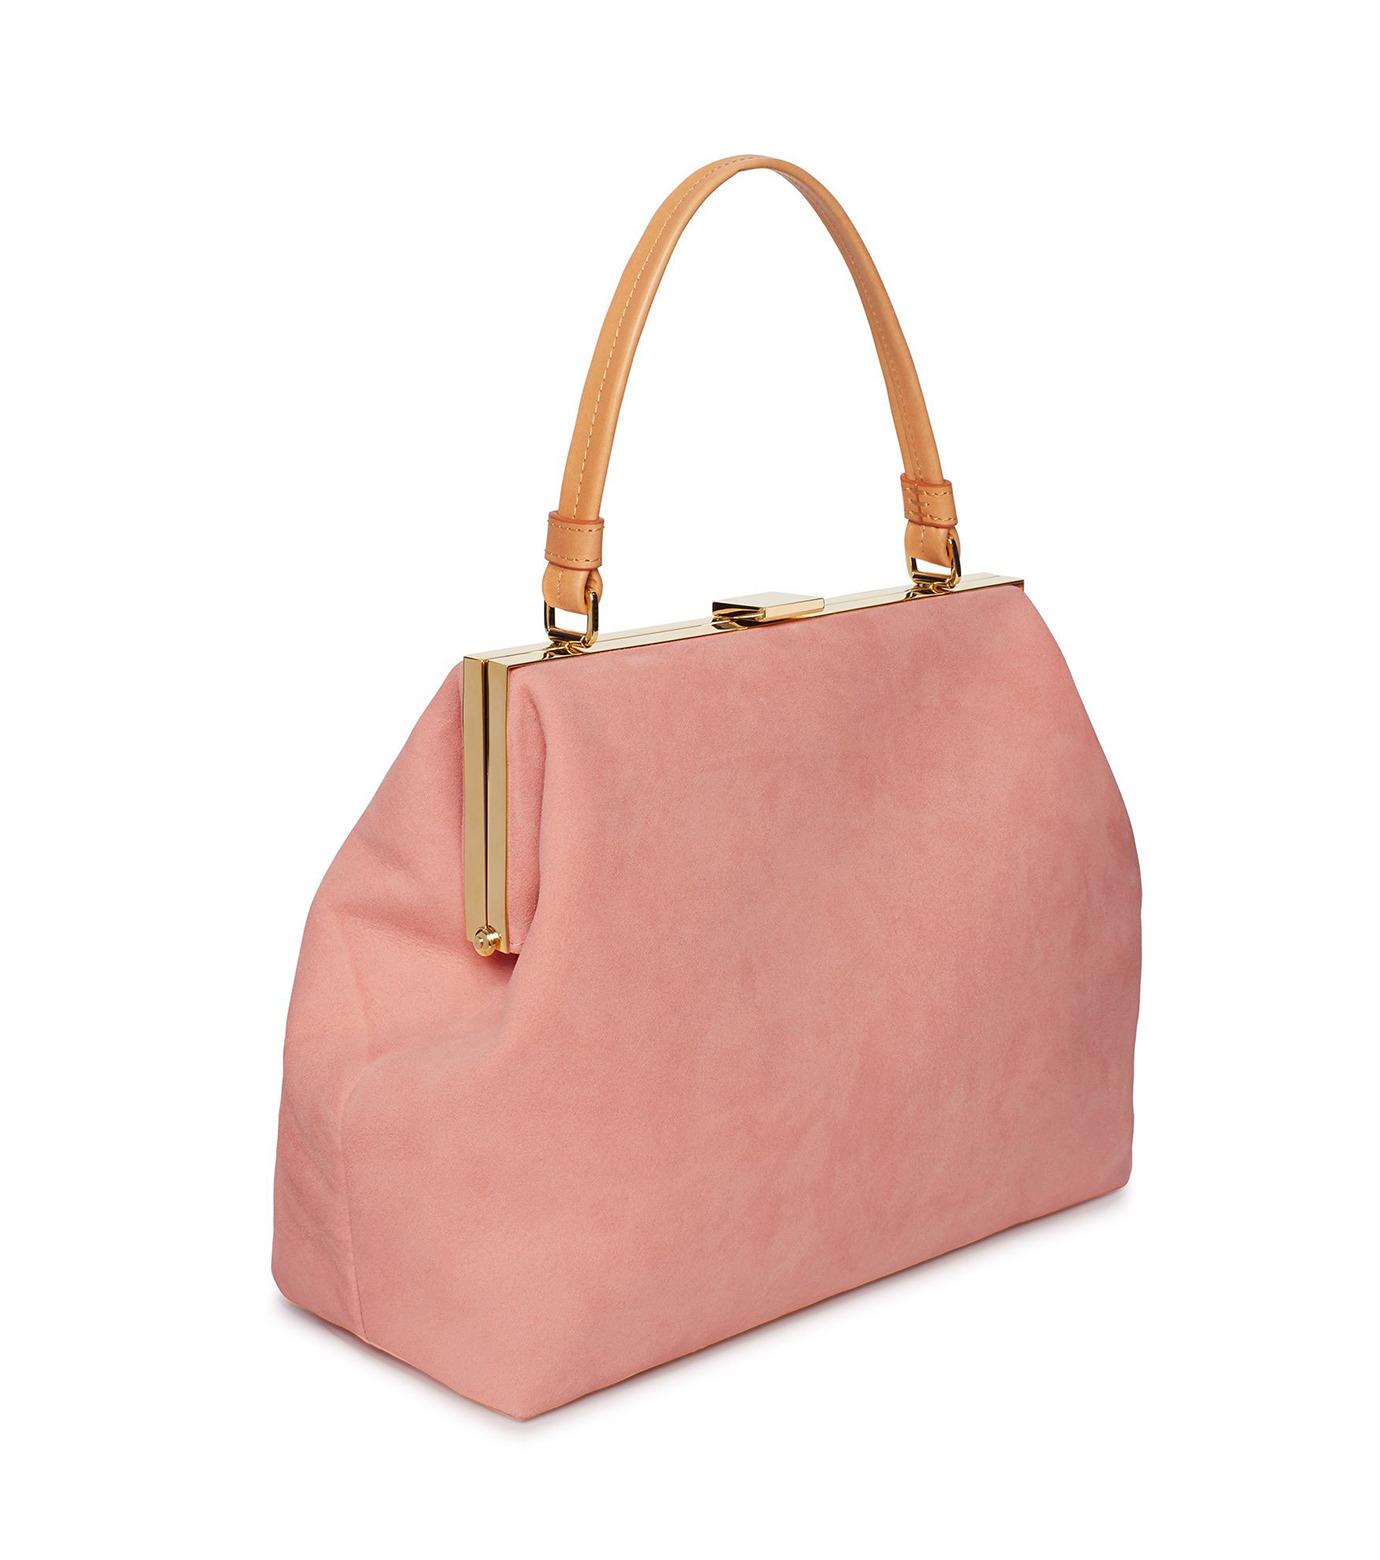 Mansur Gavriel(マンサーガブリエル)のsuede elegant bag-LIGHT PINK(ハンドバッグ/hand bag)-HEB024SU-71 拡大詳細画像2